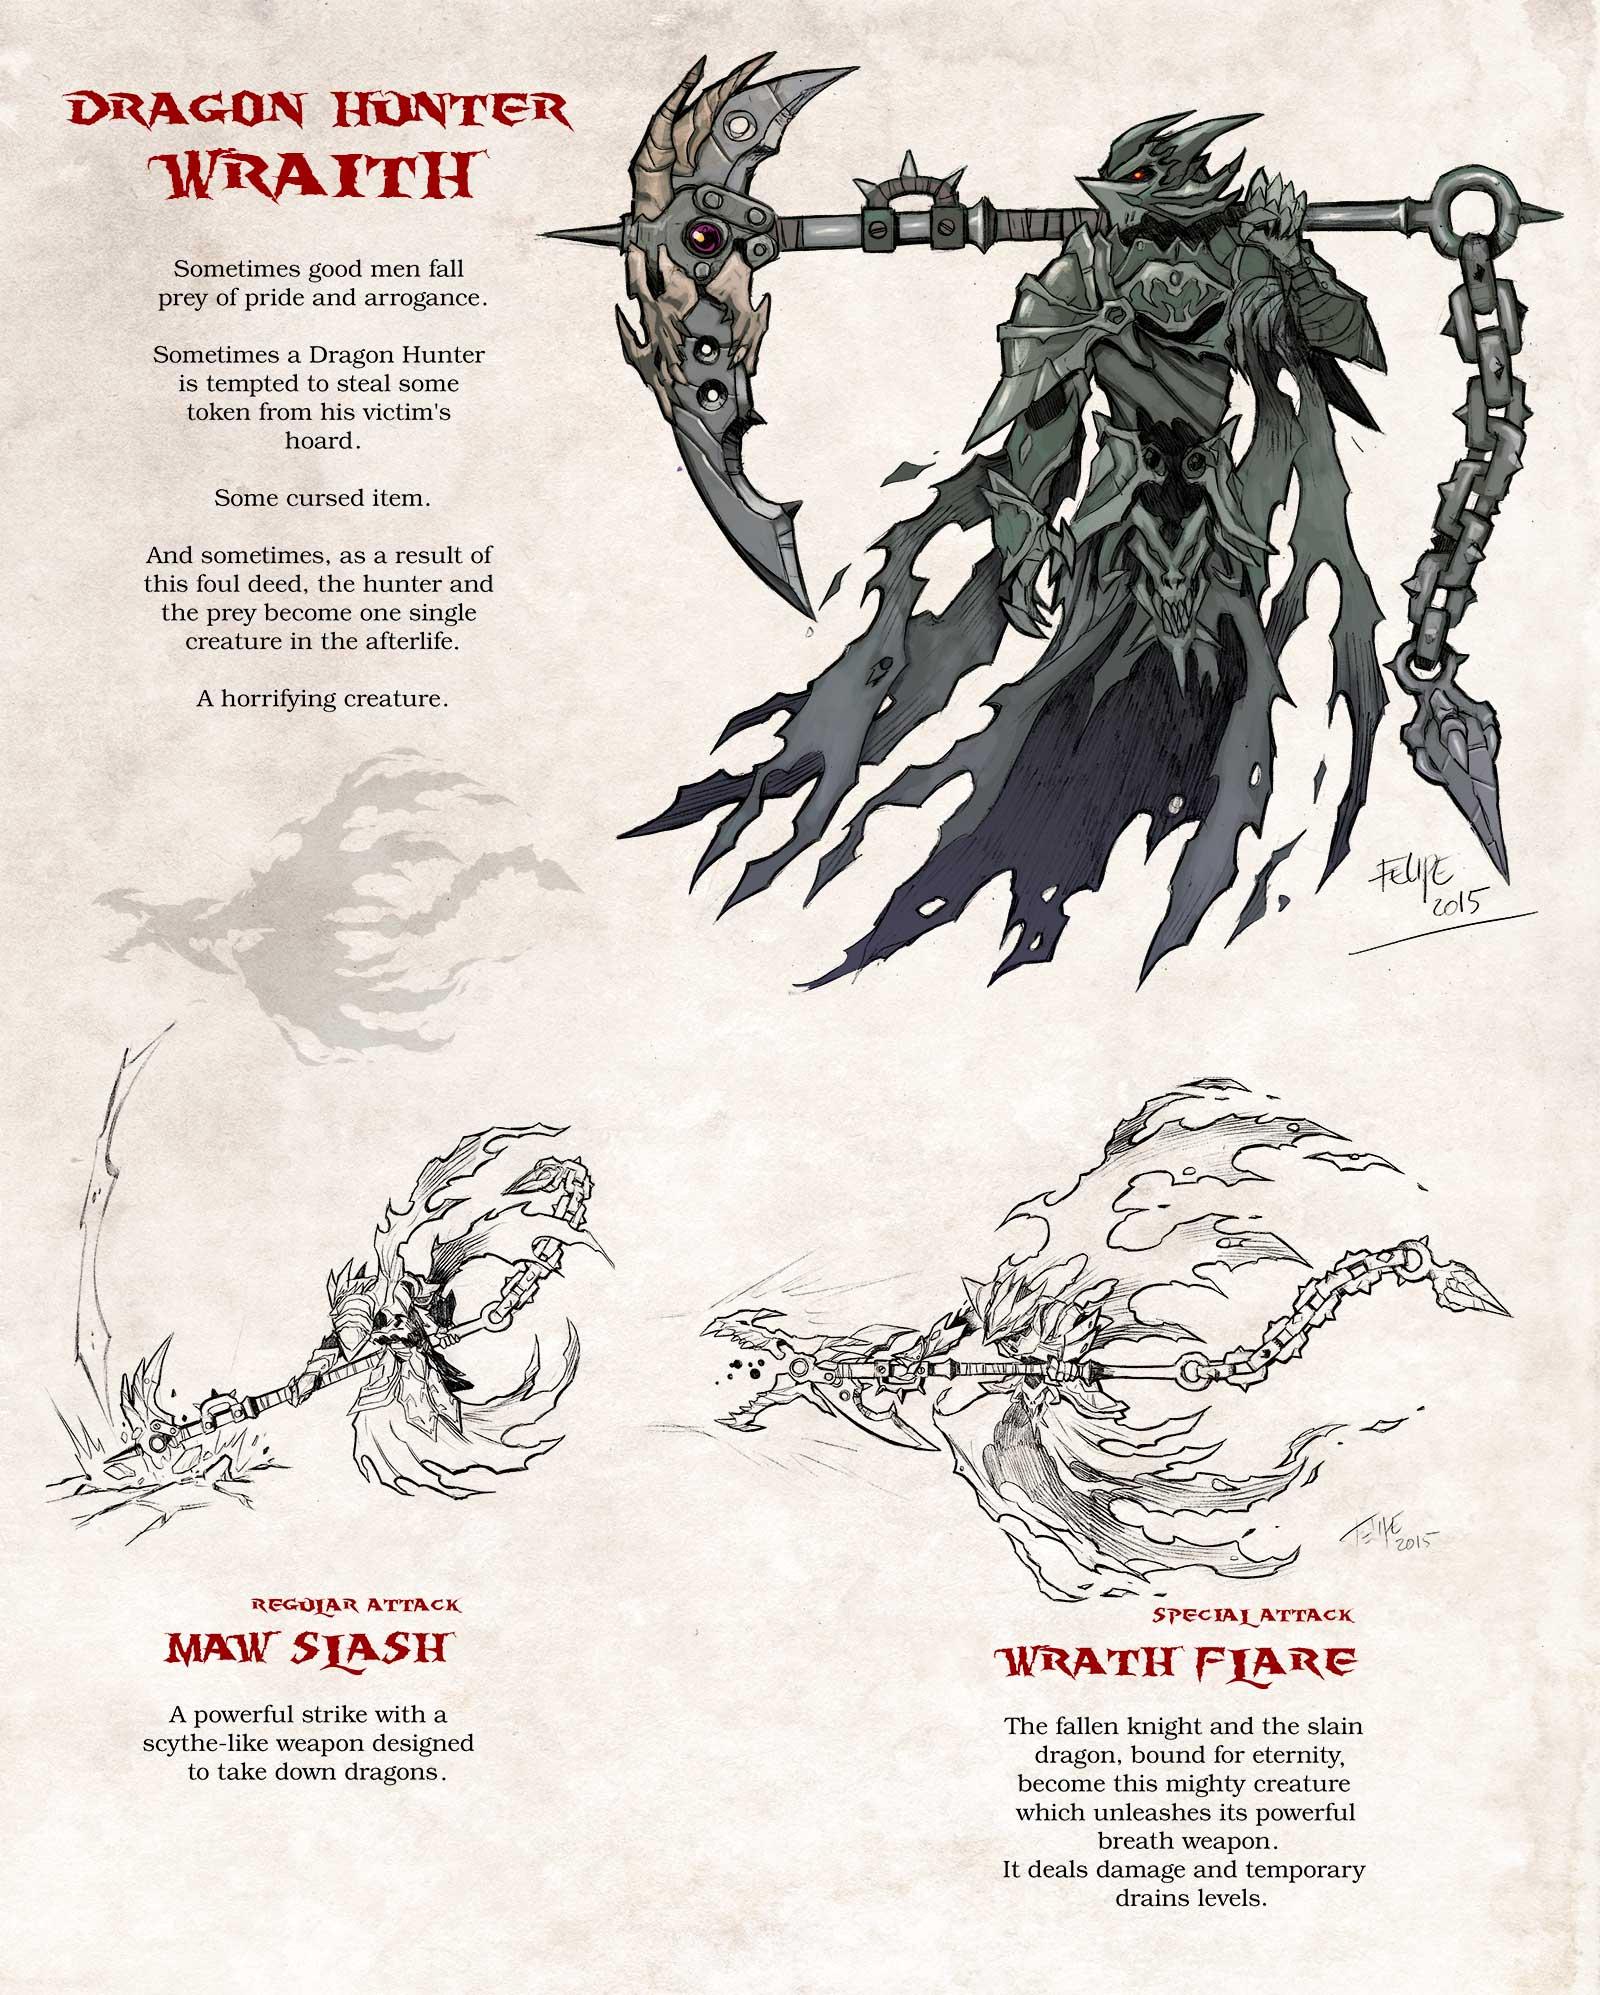 Dragon-Hunter-Wraith.jpg